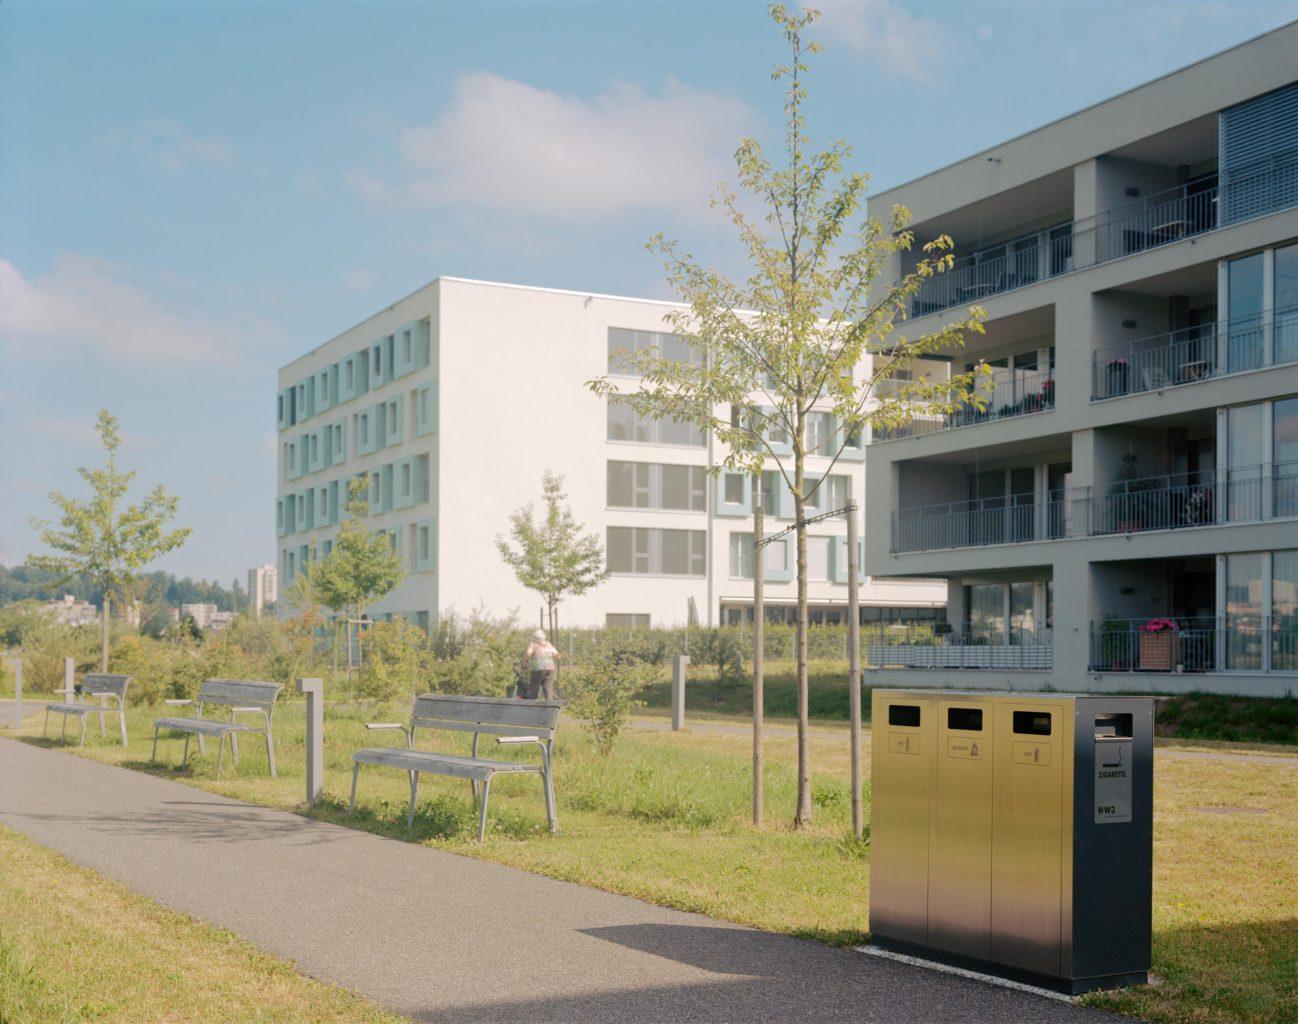 Recyclingstation W3 in Emmenfeld, Betagtencenter, Abfalltrenner, Wertstoffbehälter, Abfallbehälter Waste Bin, PET, Müll, Alu